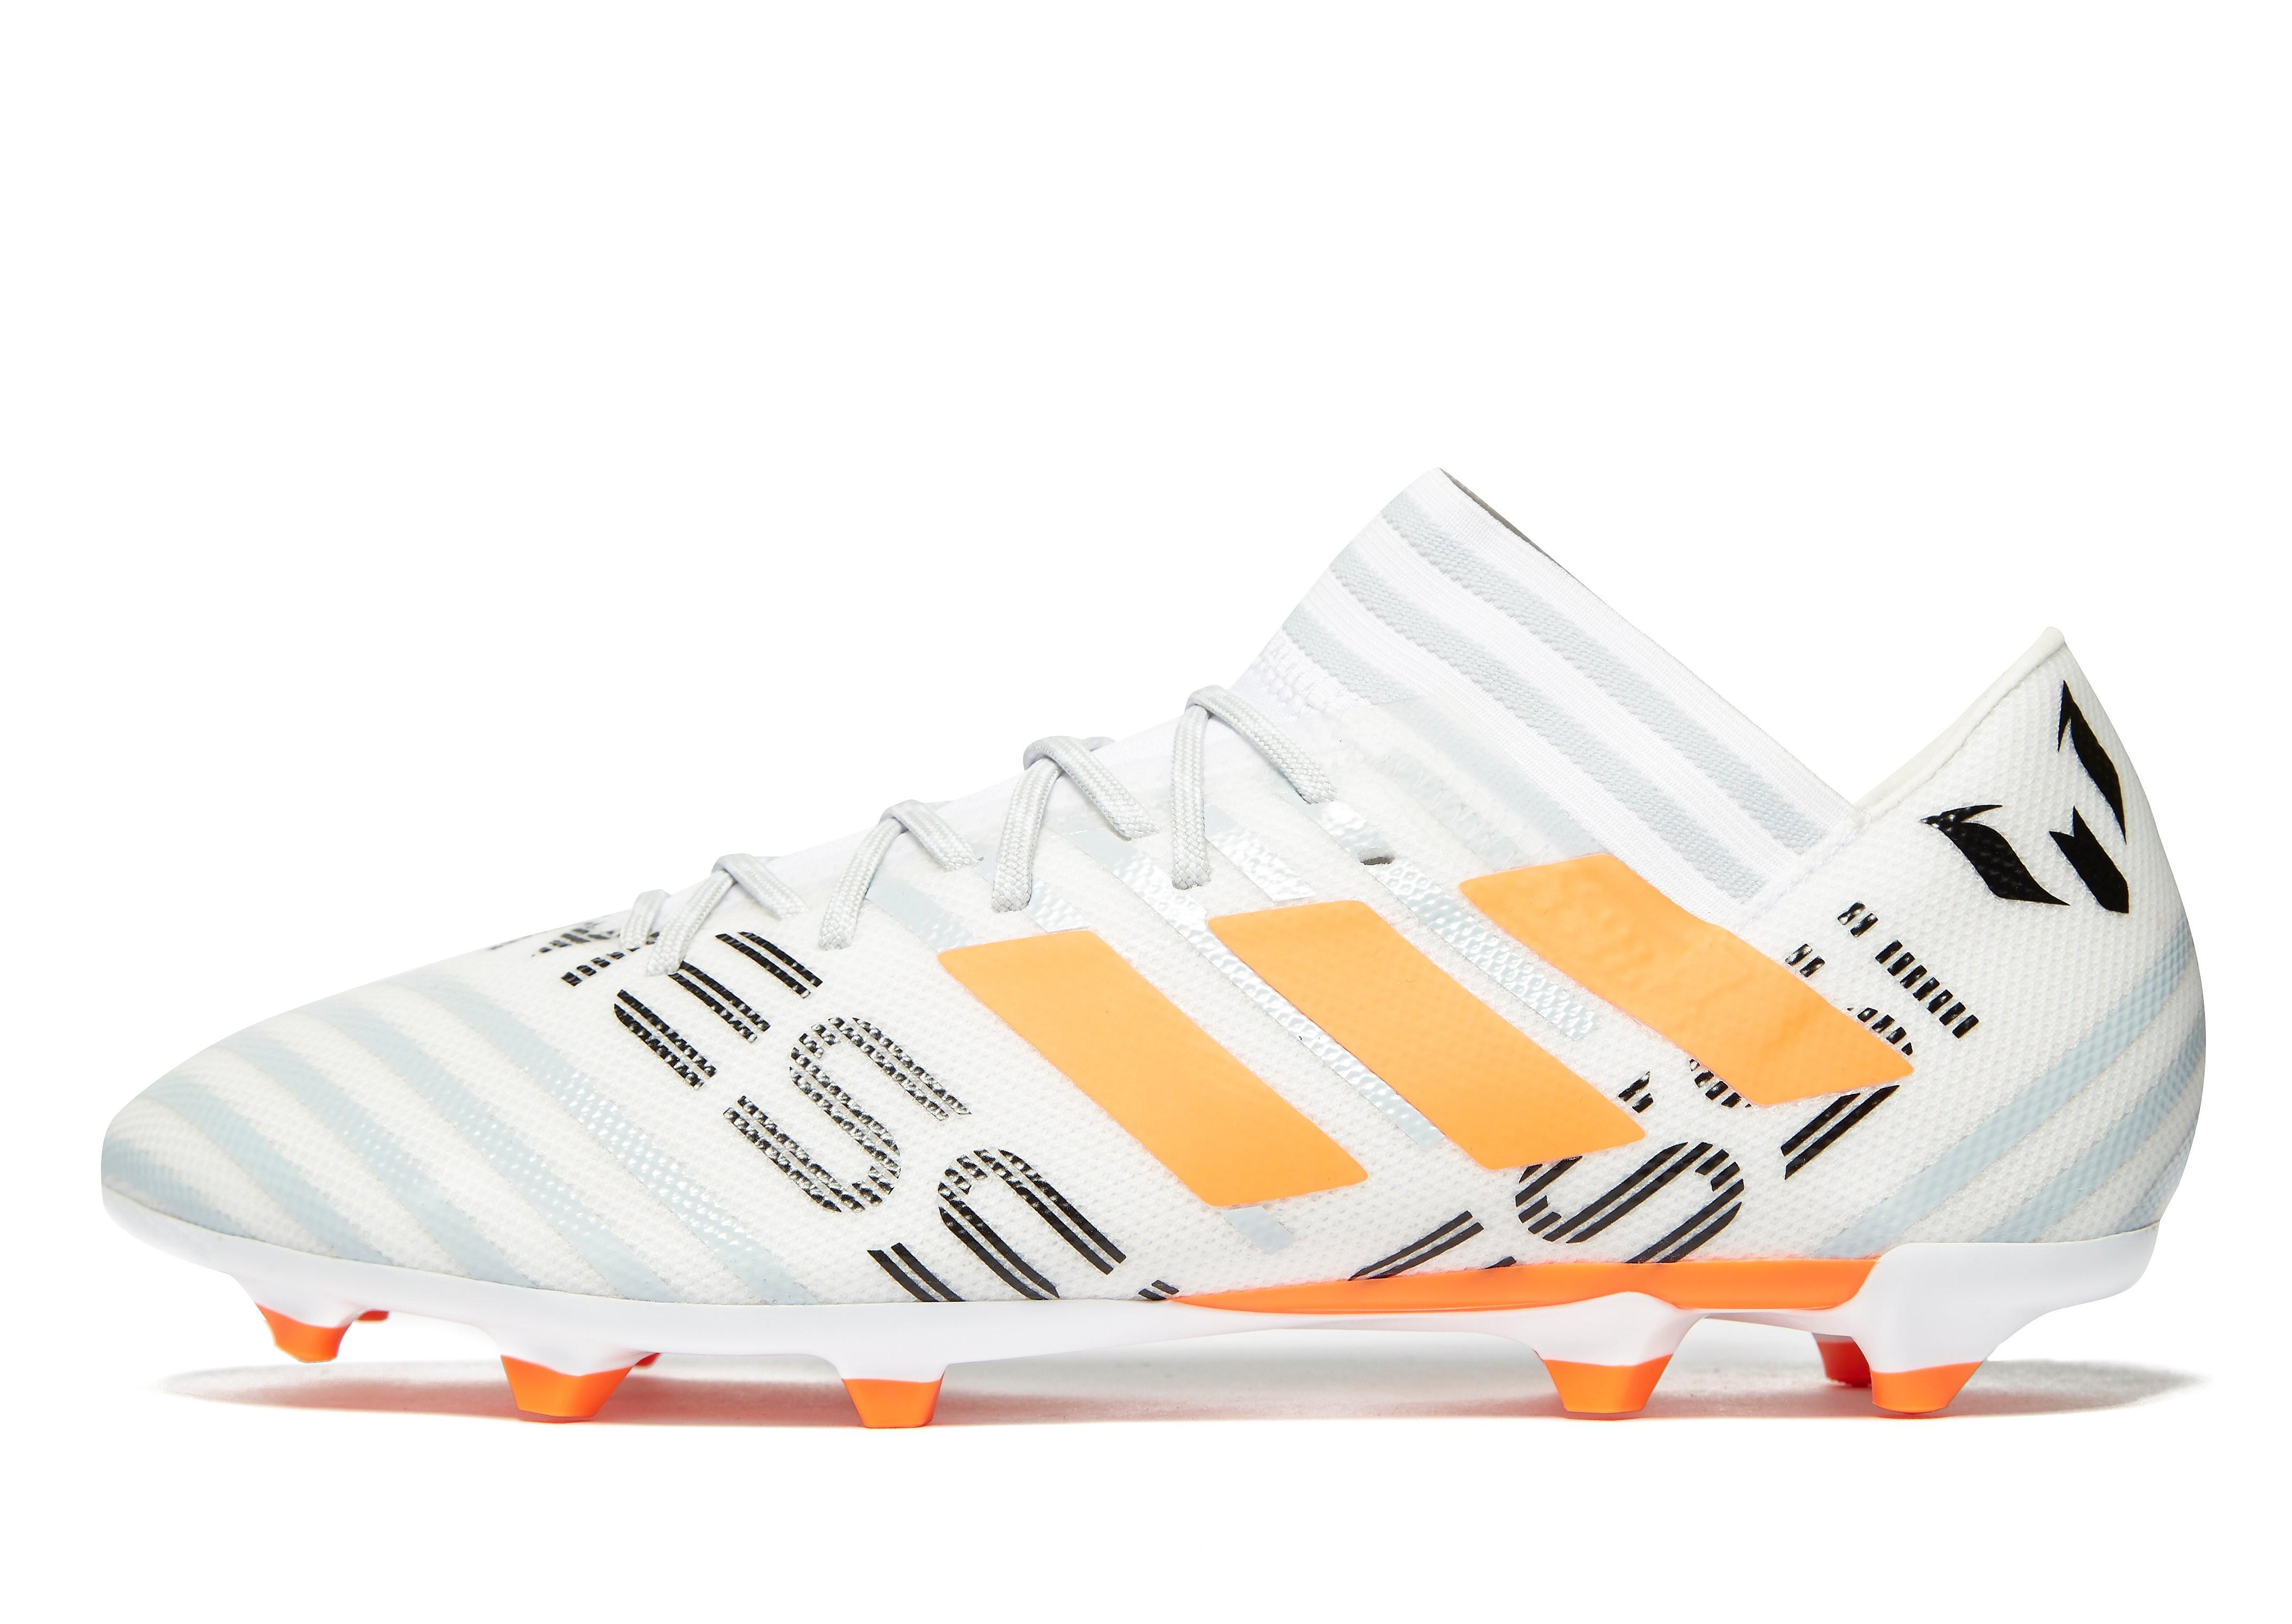 adidas Pyro Sturm Nemeziz Messi 17.3 FG